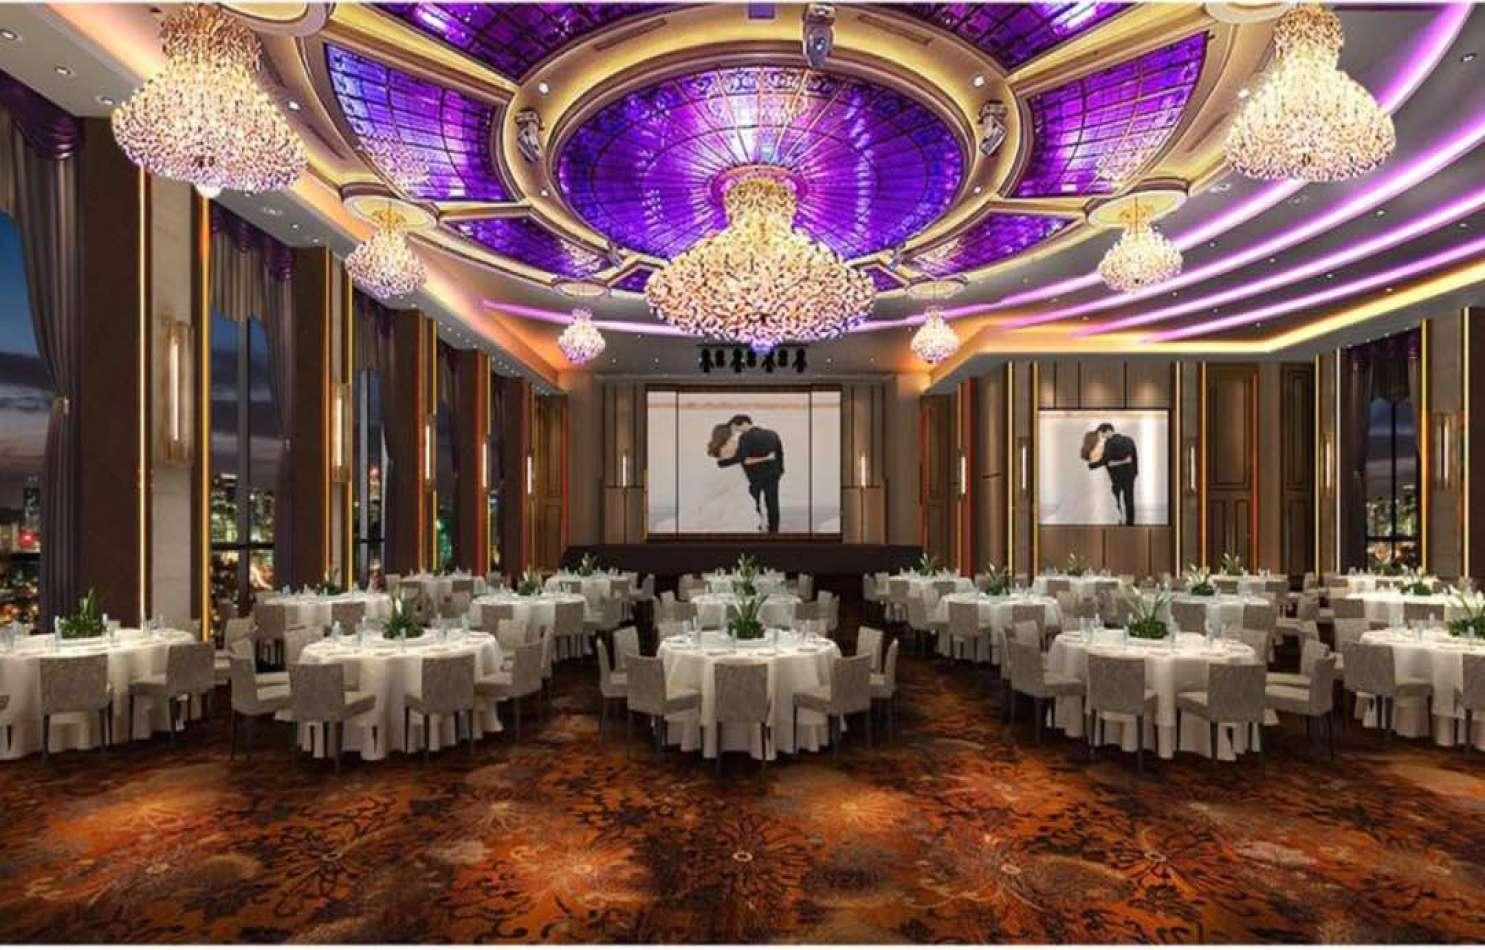 Bayu-Galaxy-Ballroom15393383815bc0708d845772.52135674.jpg